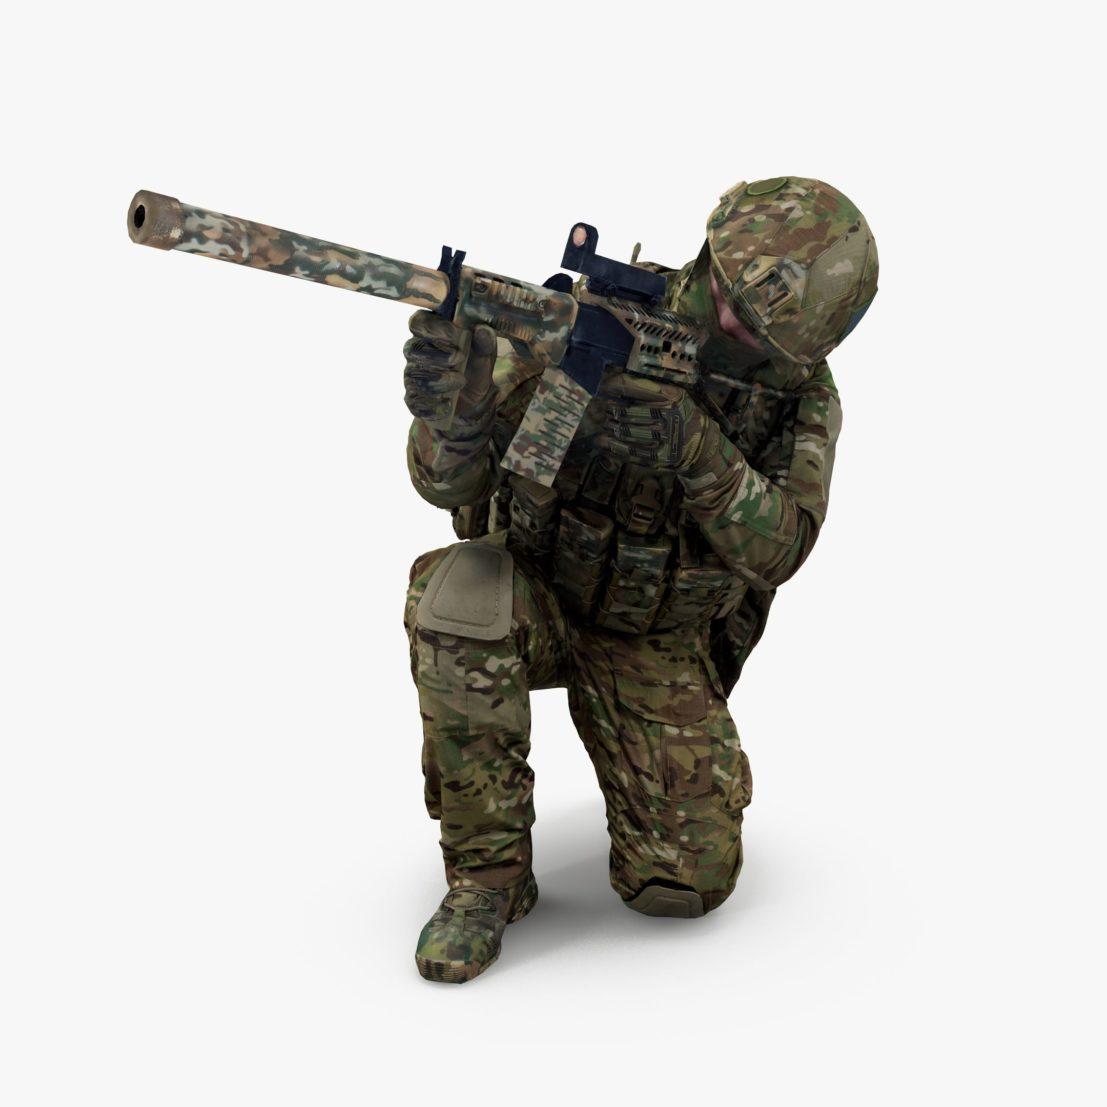 Soldier Squatting 3D Model | 3DTree Scanning Studio